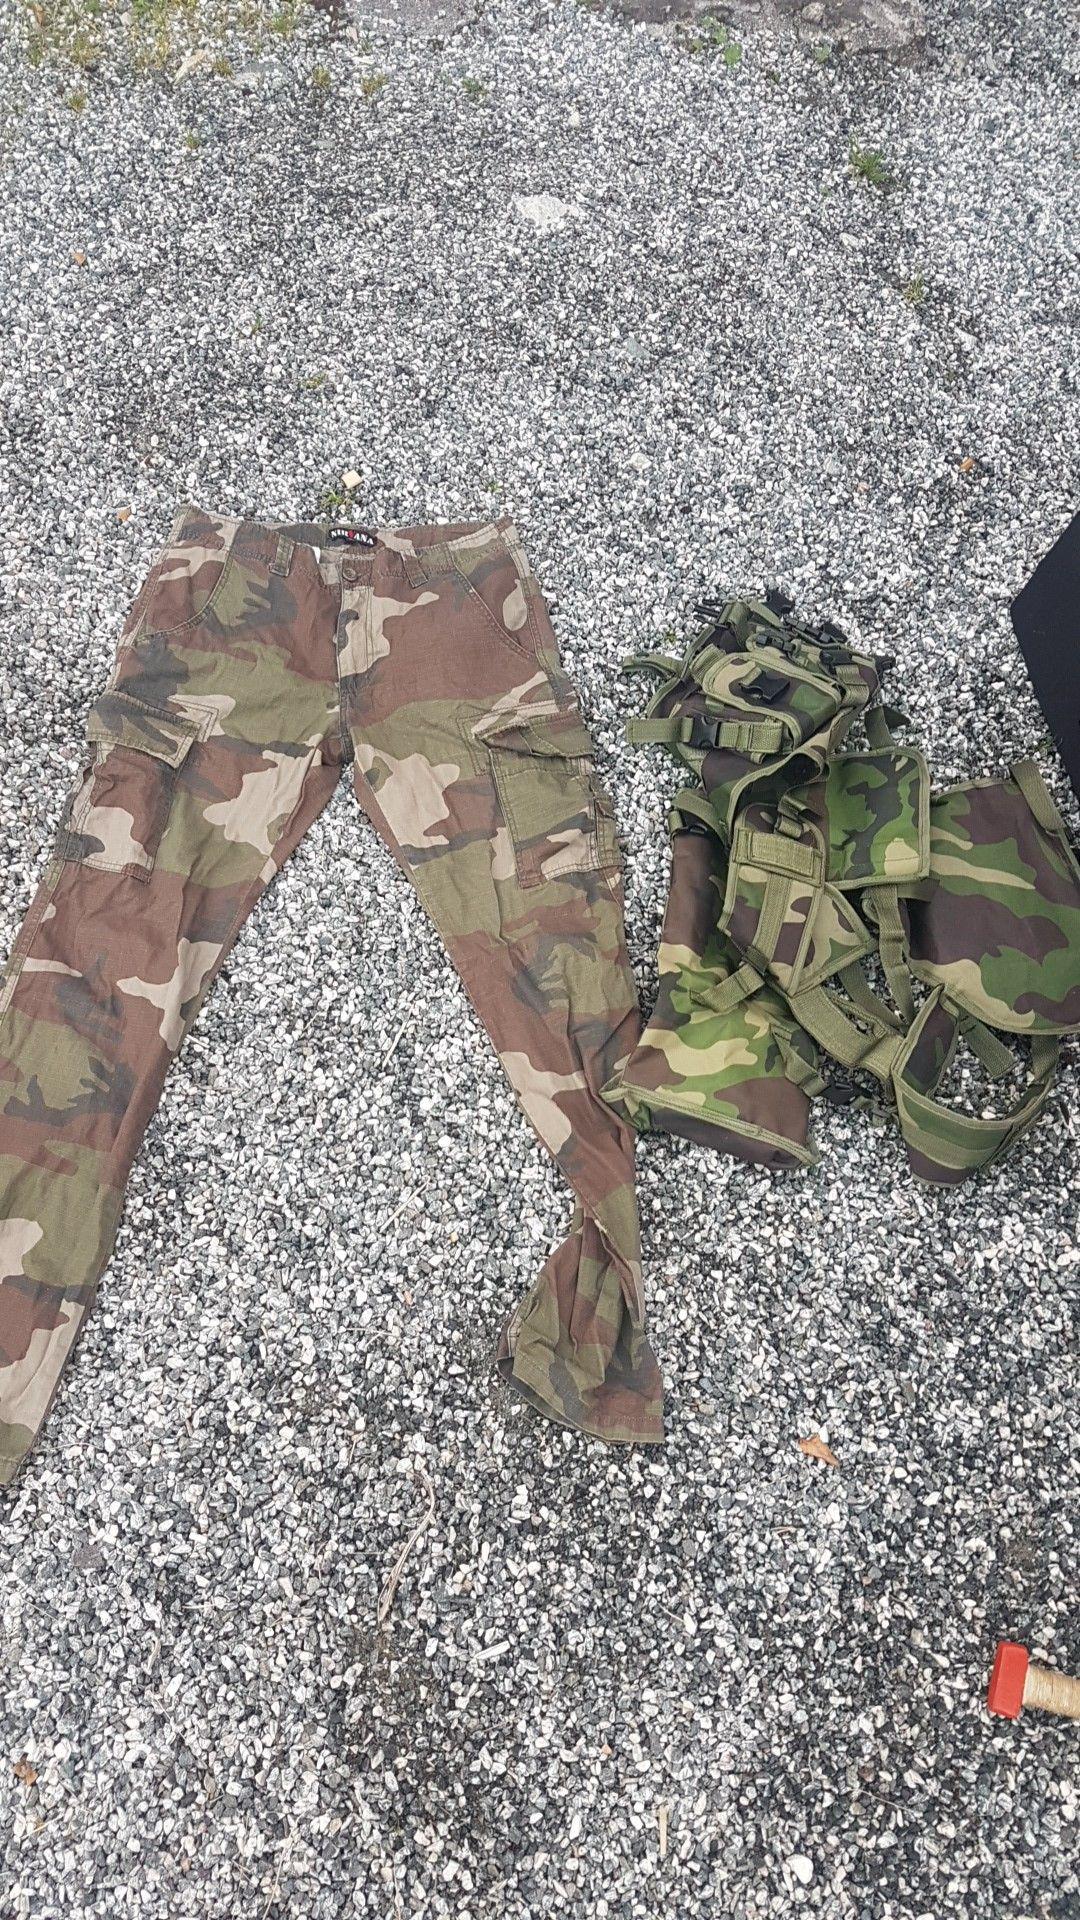 Militær bukse og skulderbelte for lek nerf og rollespill